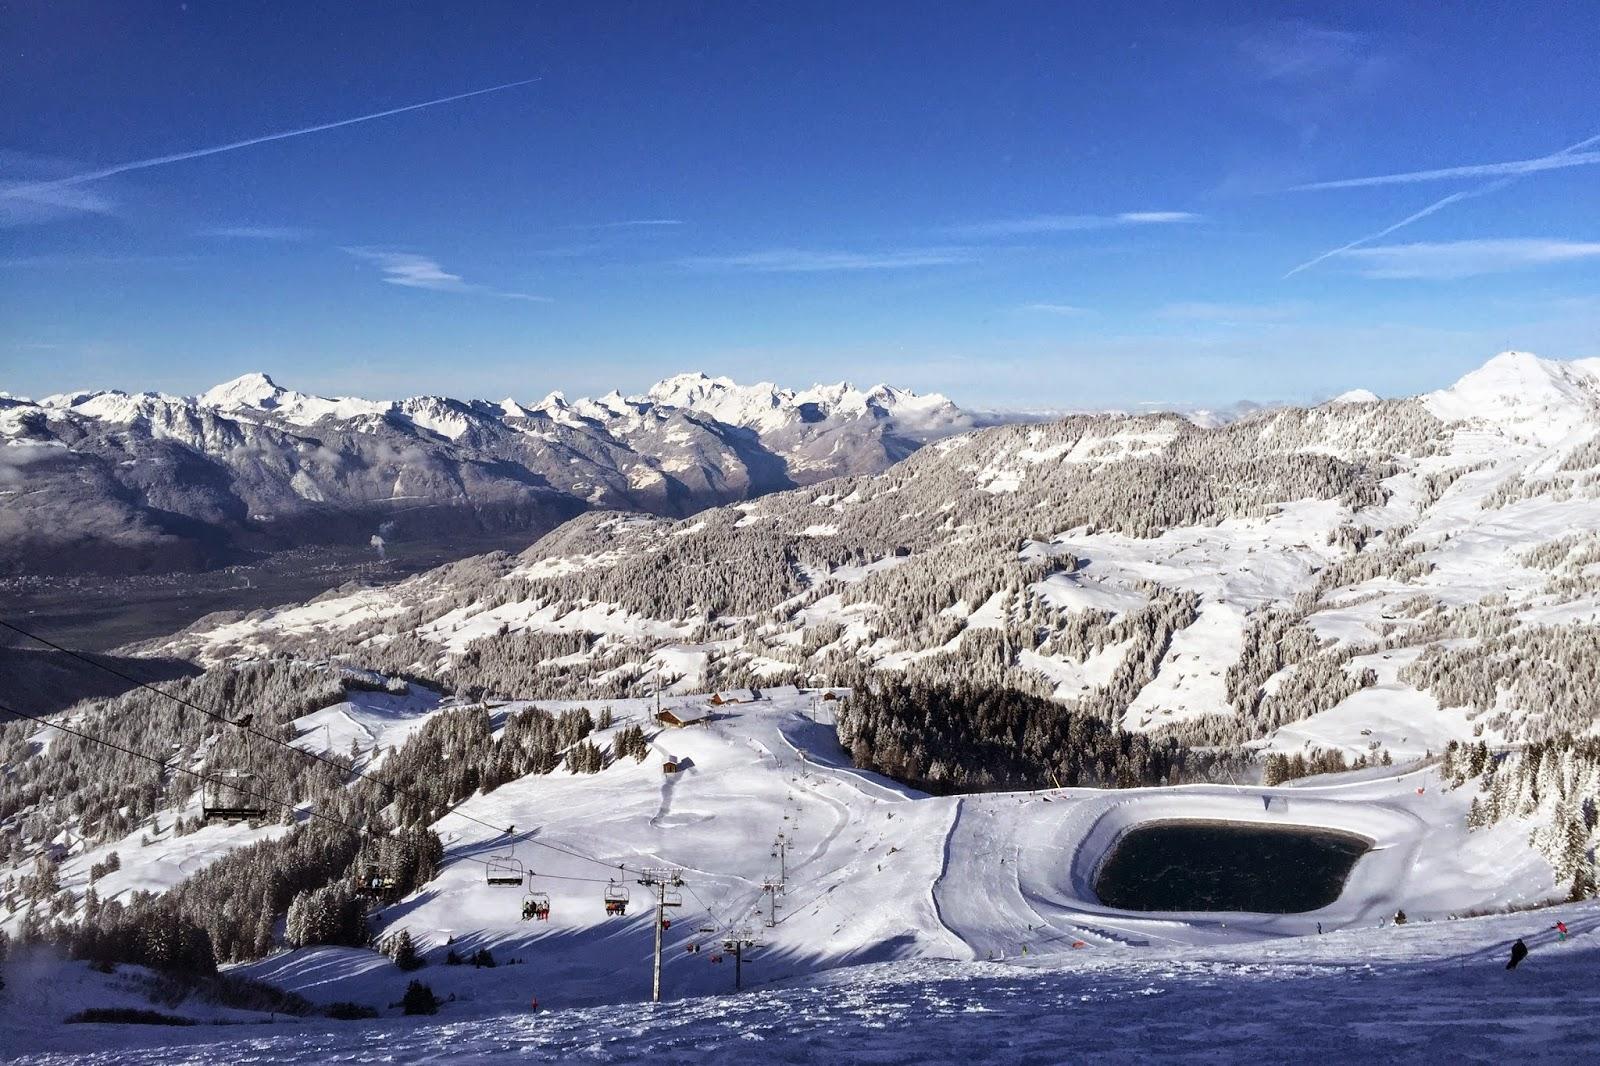 vue station ski villars parking telecabine prix precio